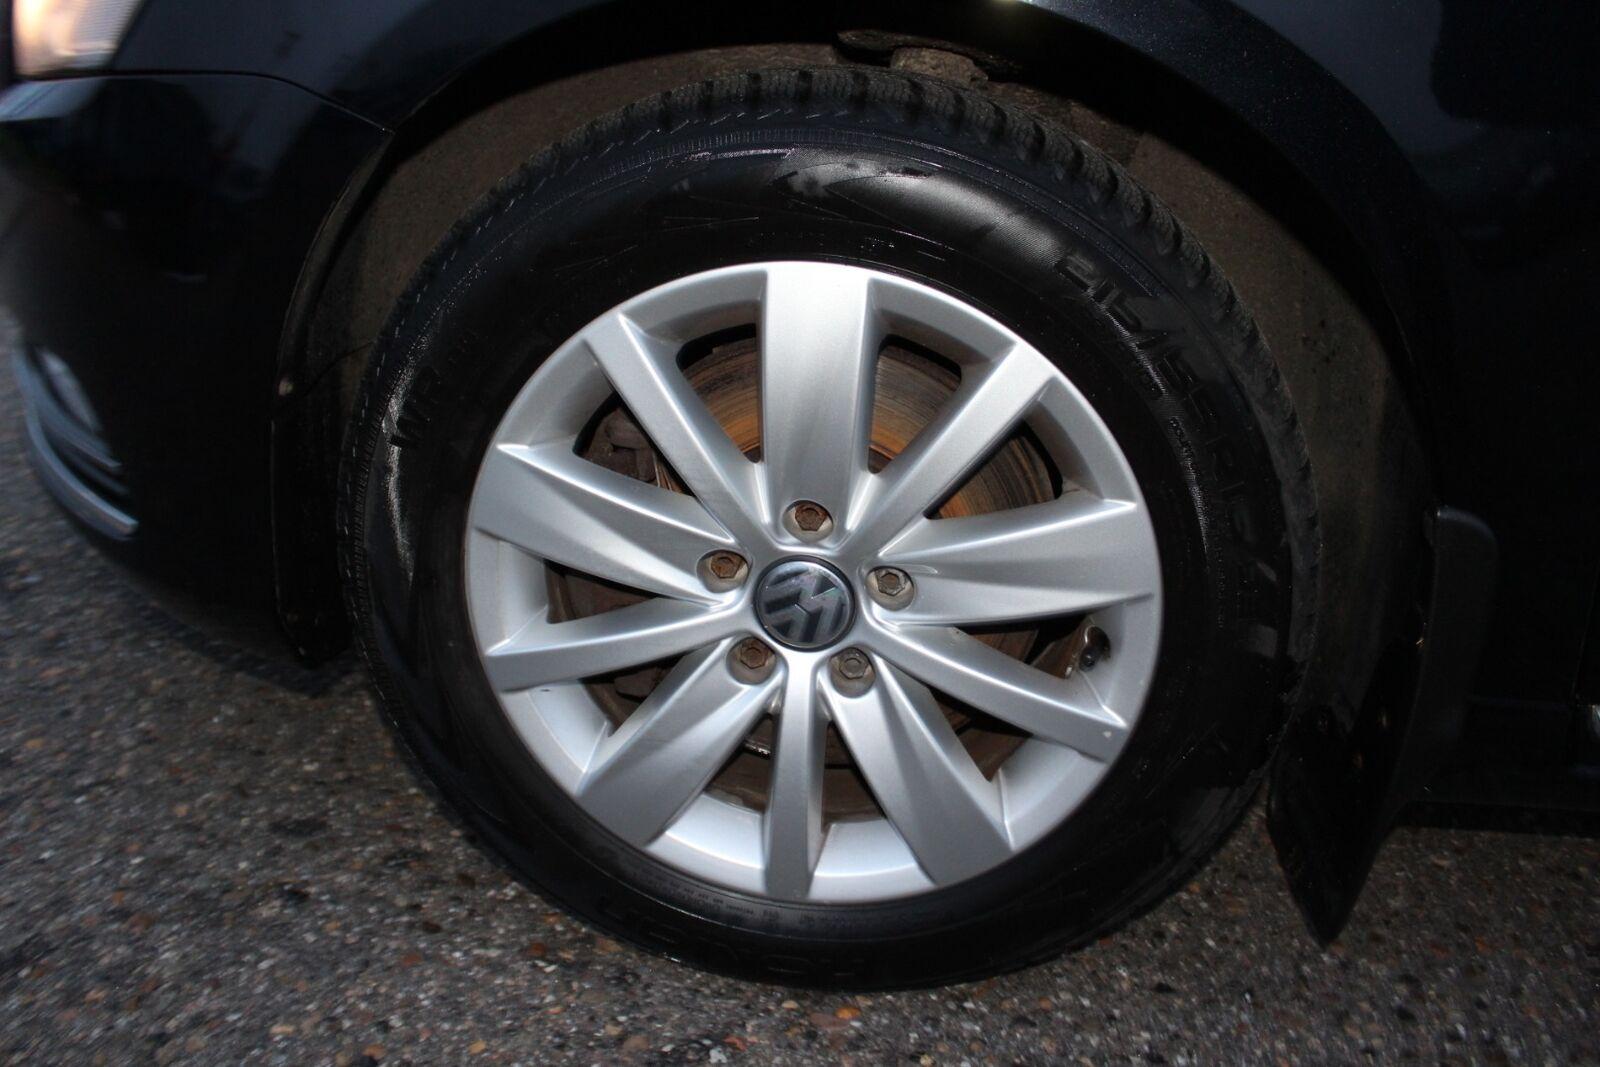 VW Passat 2,0 TDi 140 Comfortl. Vari. BMT - billede 4